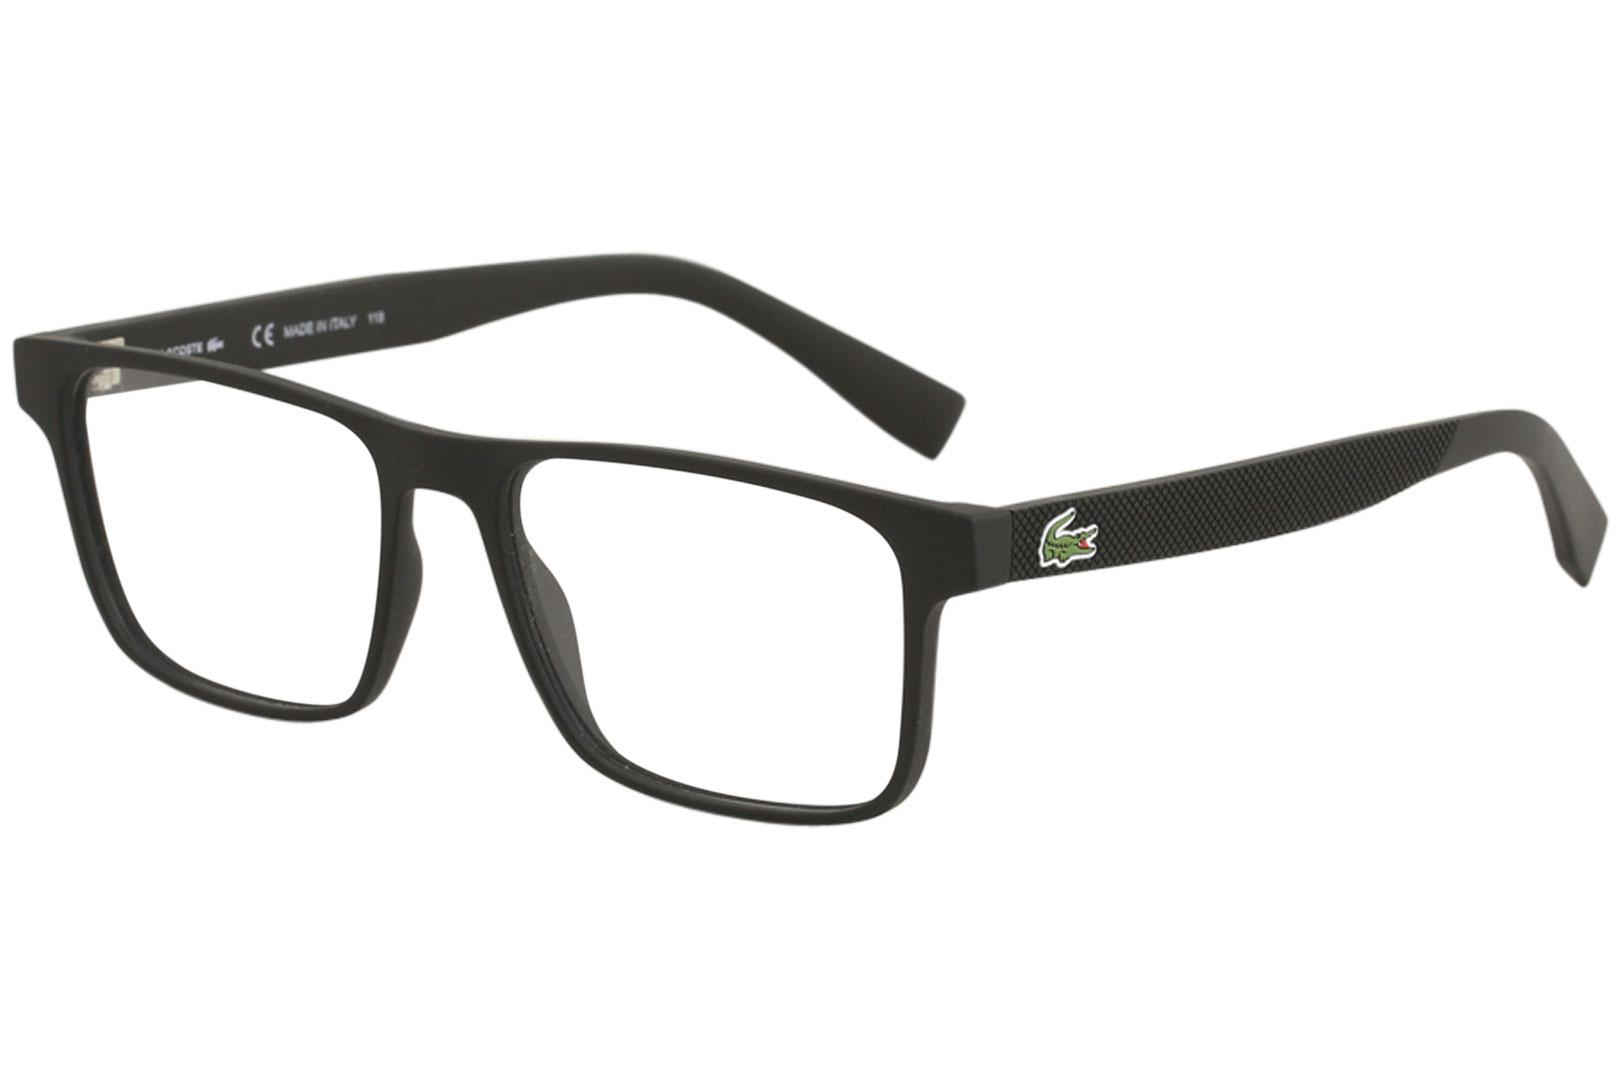 0d7459f18a1 Lacoste Men s Eyeglasses L2817 L 2817 Full Rim Optical Frame